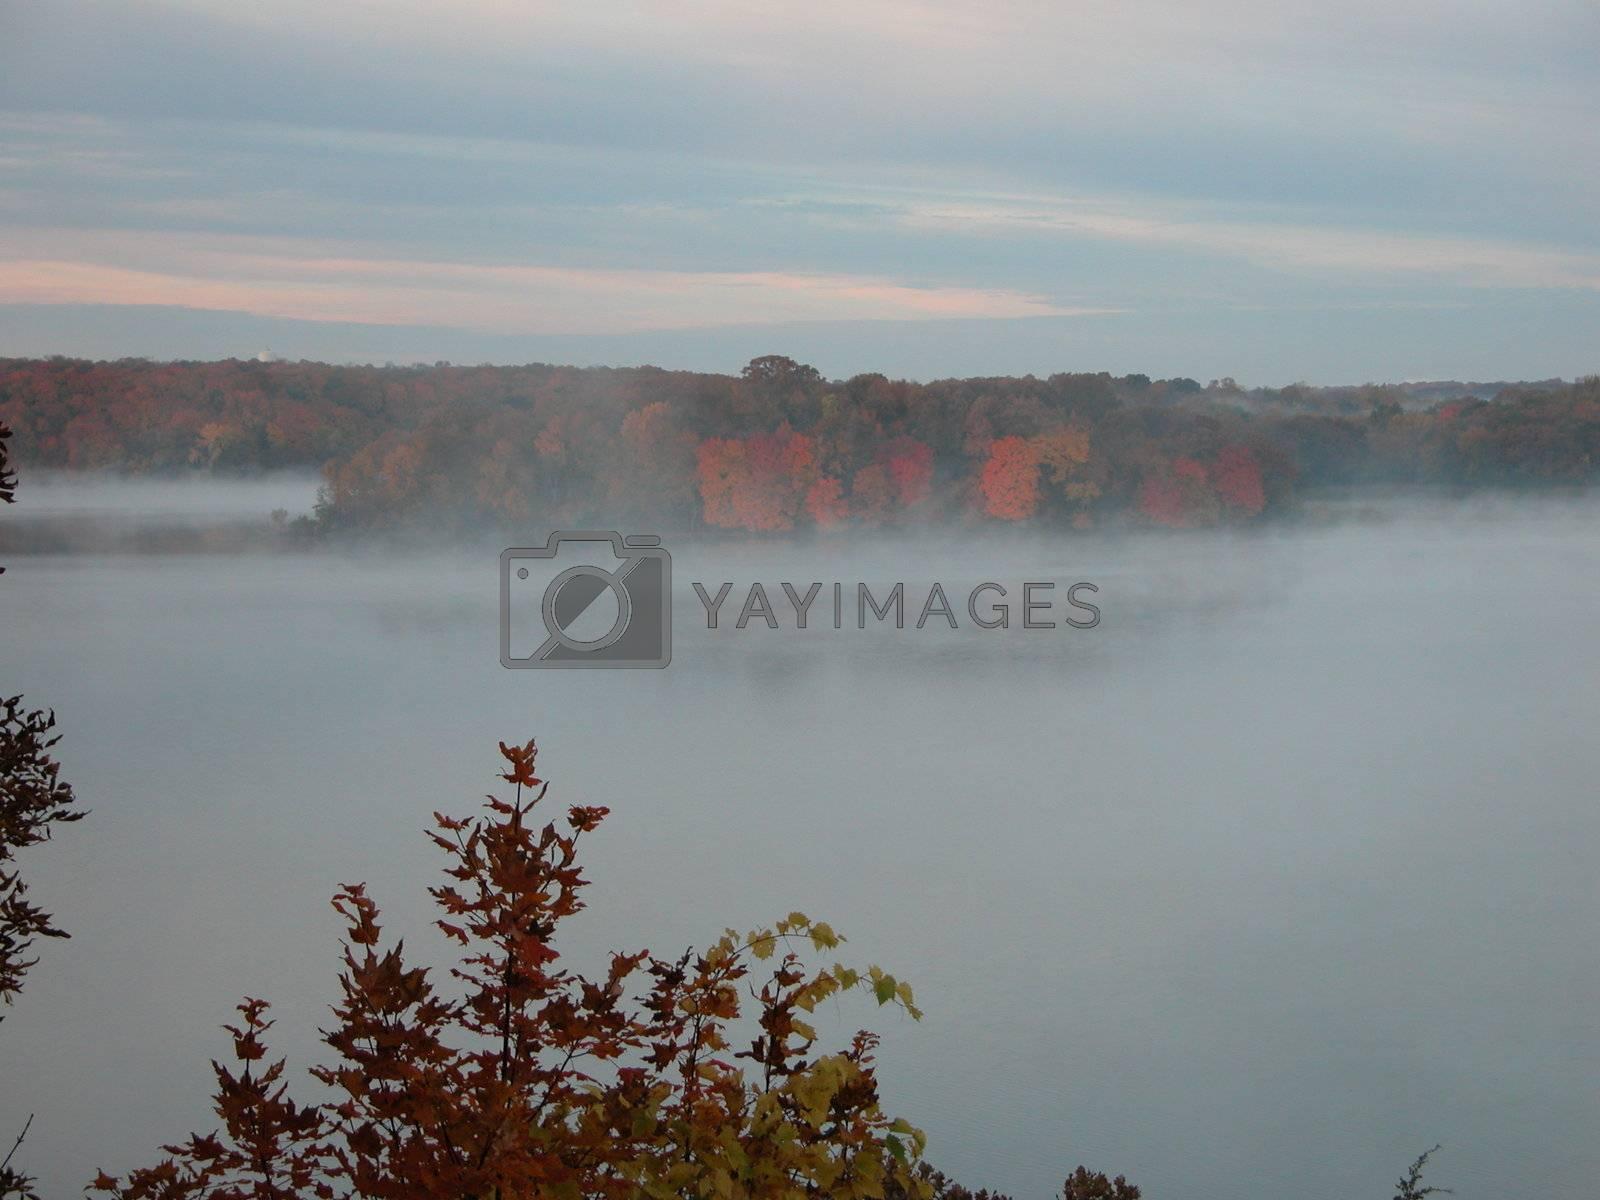 Island on a steamy lake